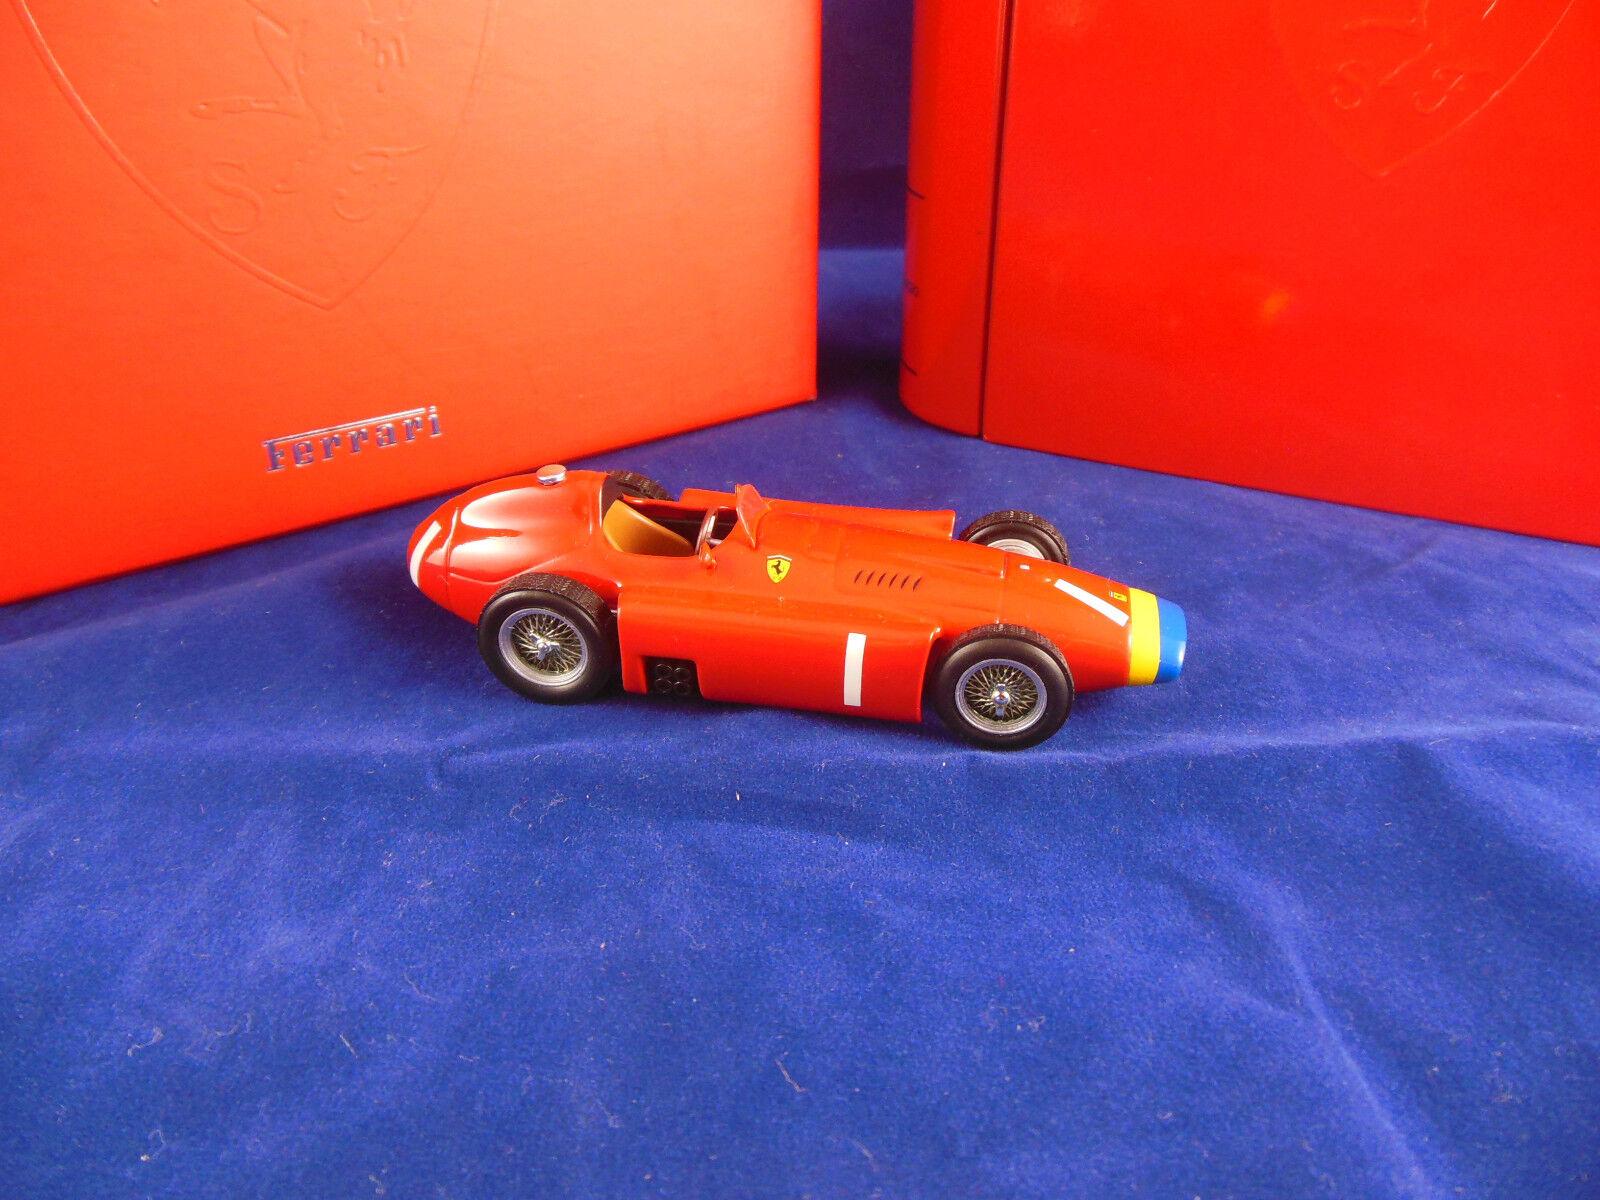 Molto RARA Hotwheels Mattel SF01/56 FERRARI D60 1956 J M FANGIO scala 1:43